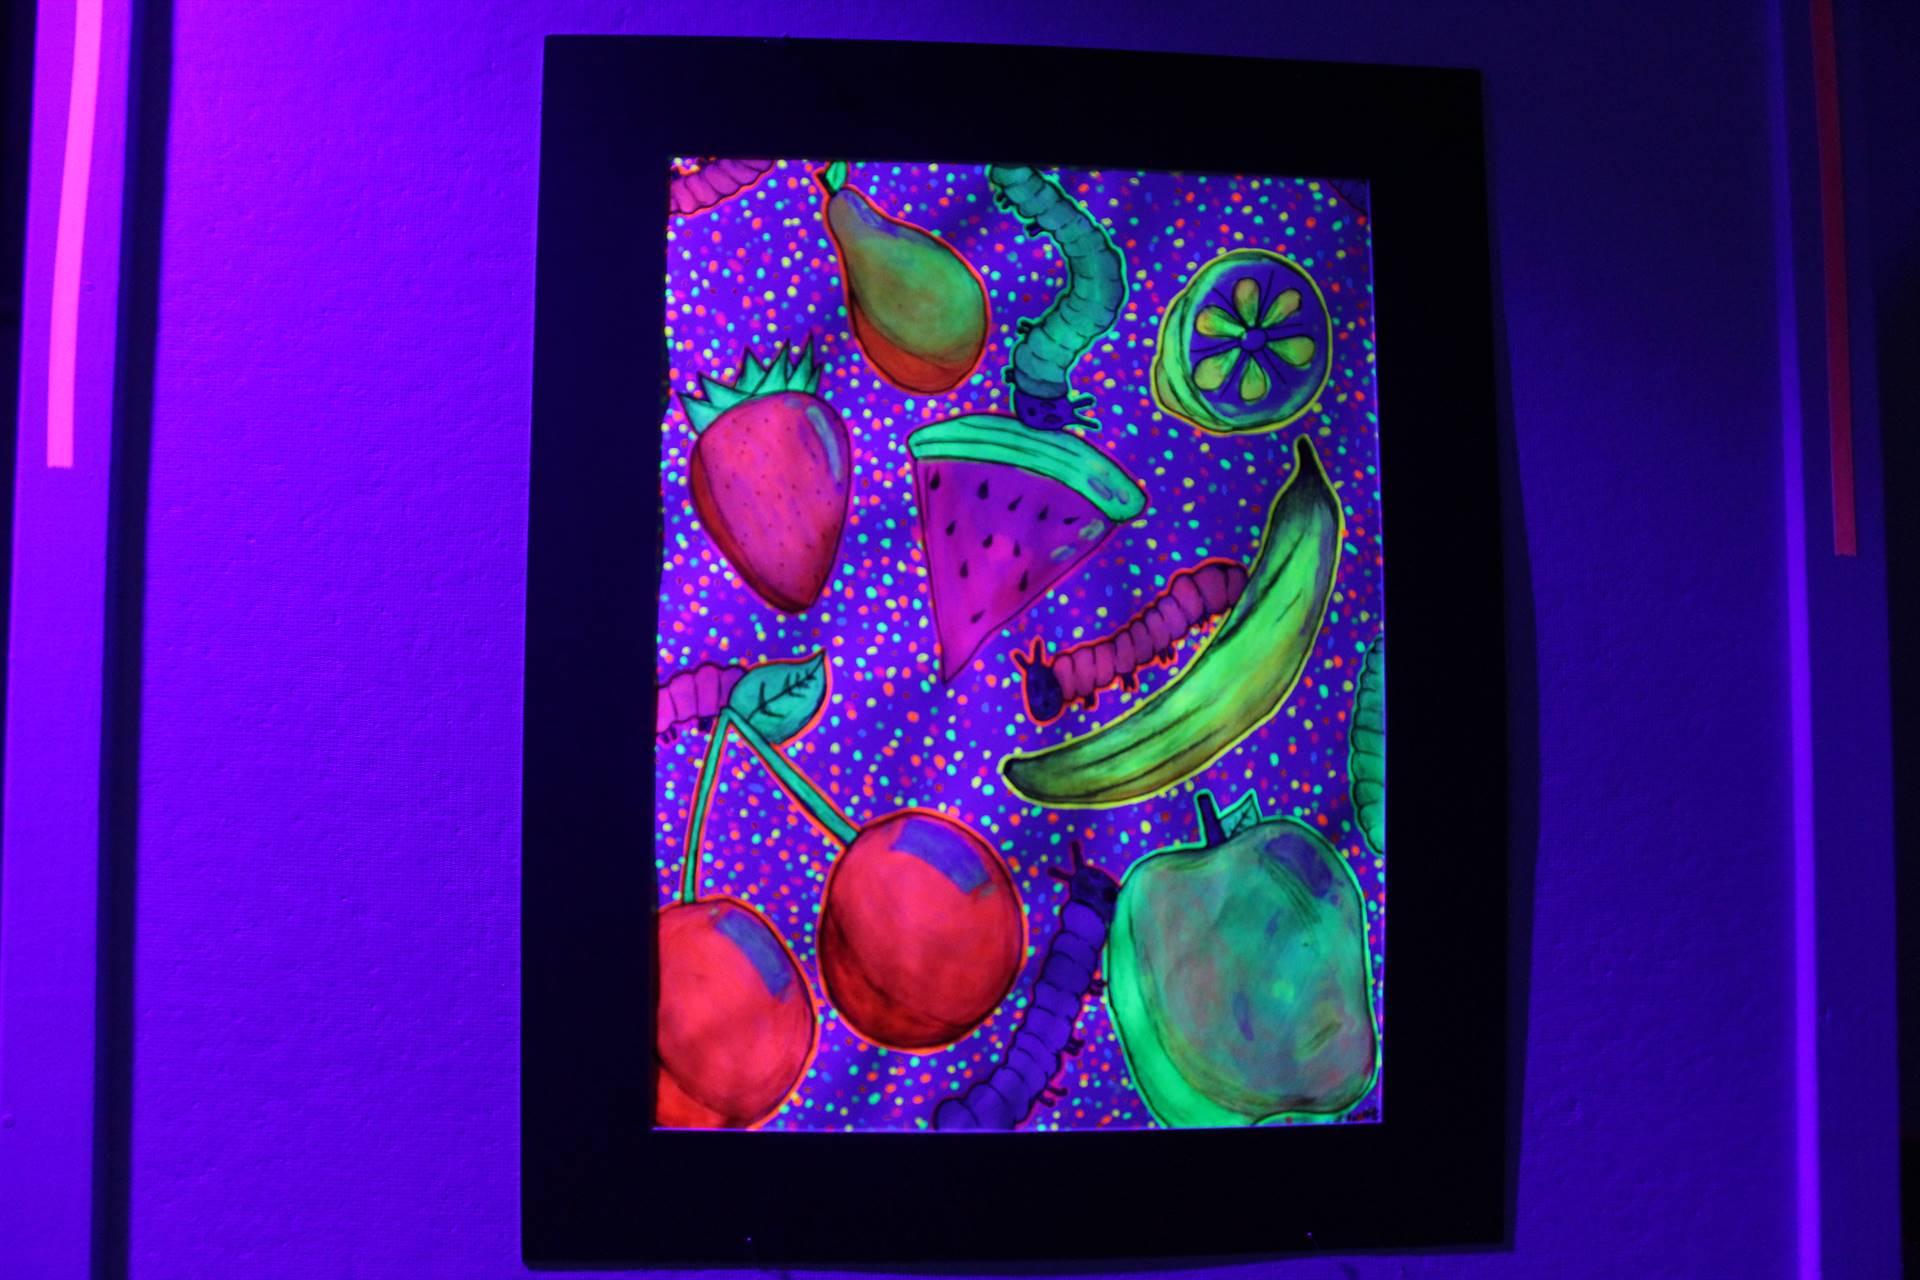 MZ Art Gallery